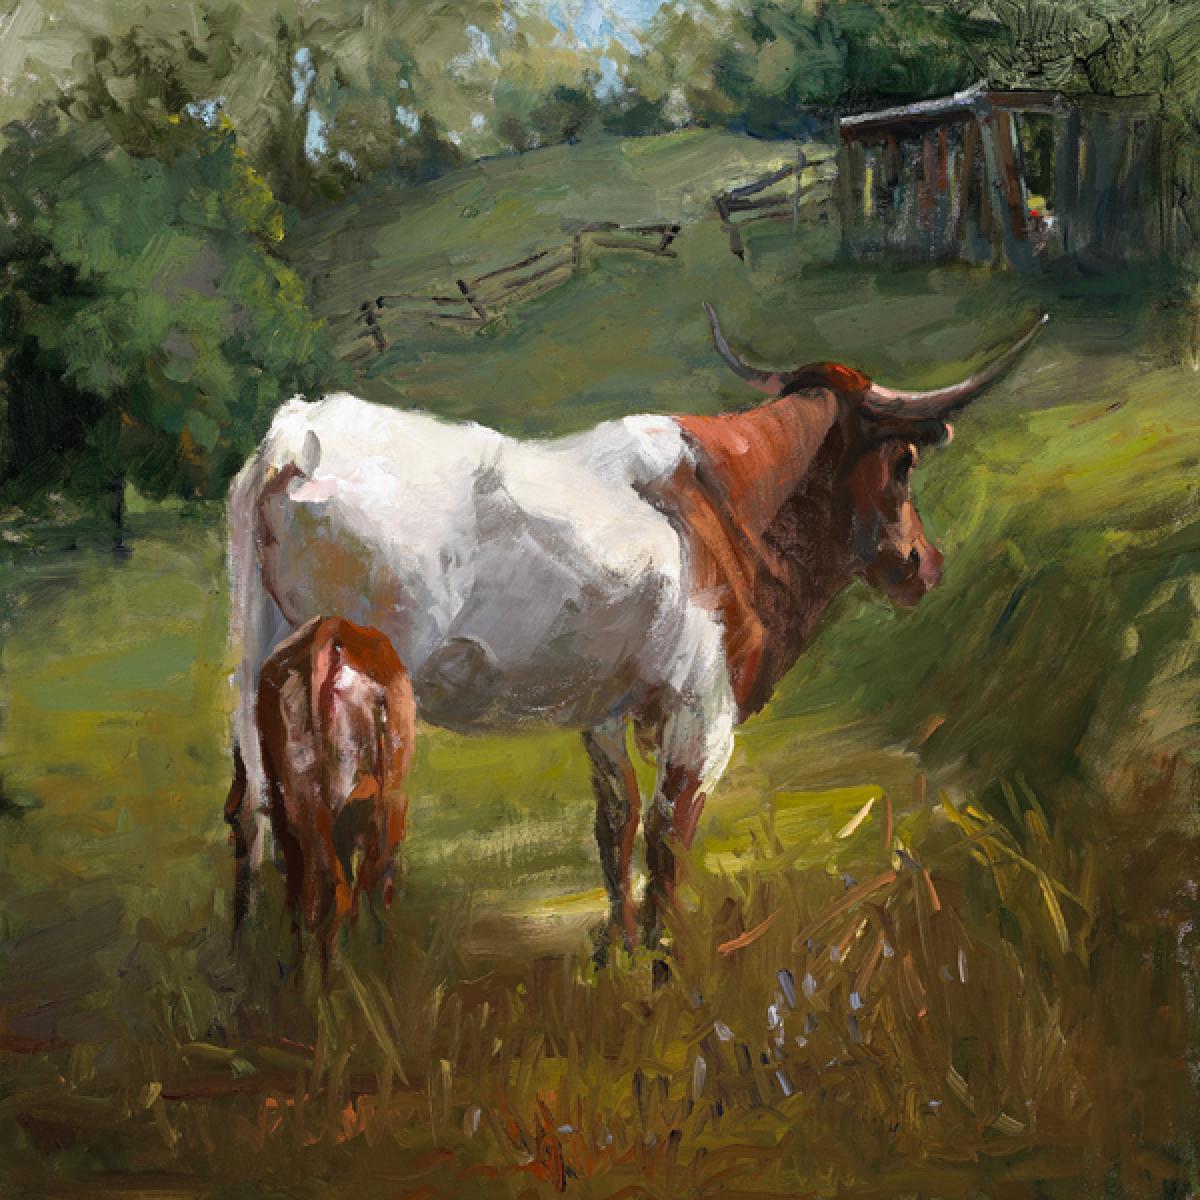 Texas Longhorn, oil painting, Award of Excellence, Southwest Art, Western Art